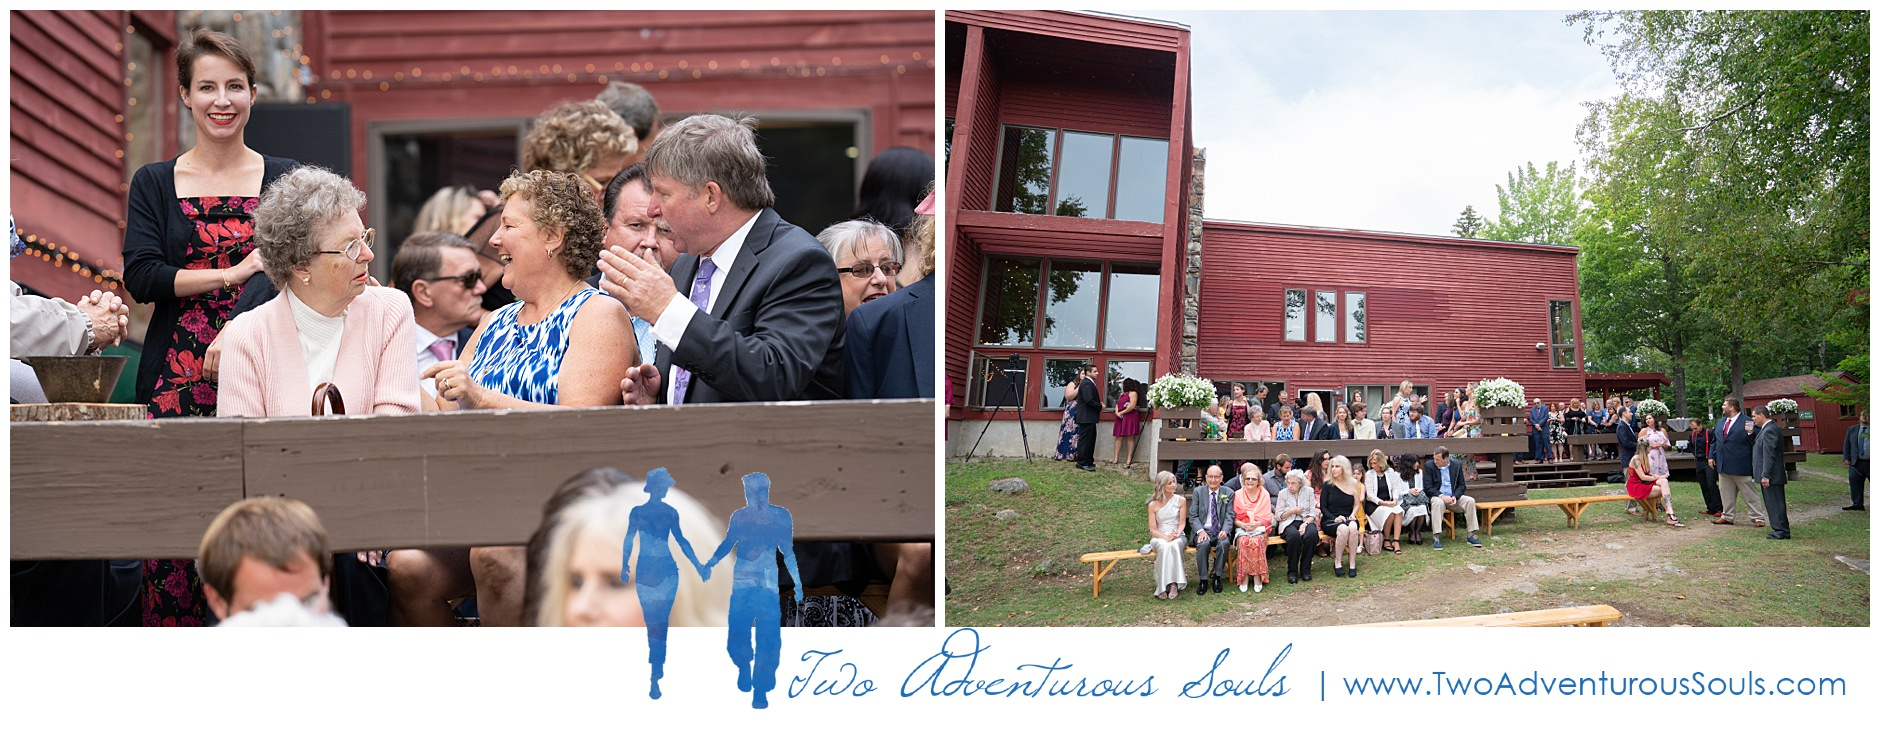 Sugarloaf Outdoor Center Wedding Photographers, Destination Wedding Photographers, Two Adventurous Souls-081719_0031.jpg